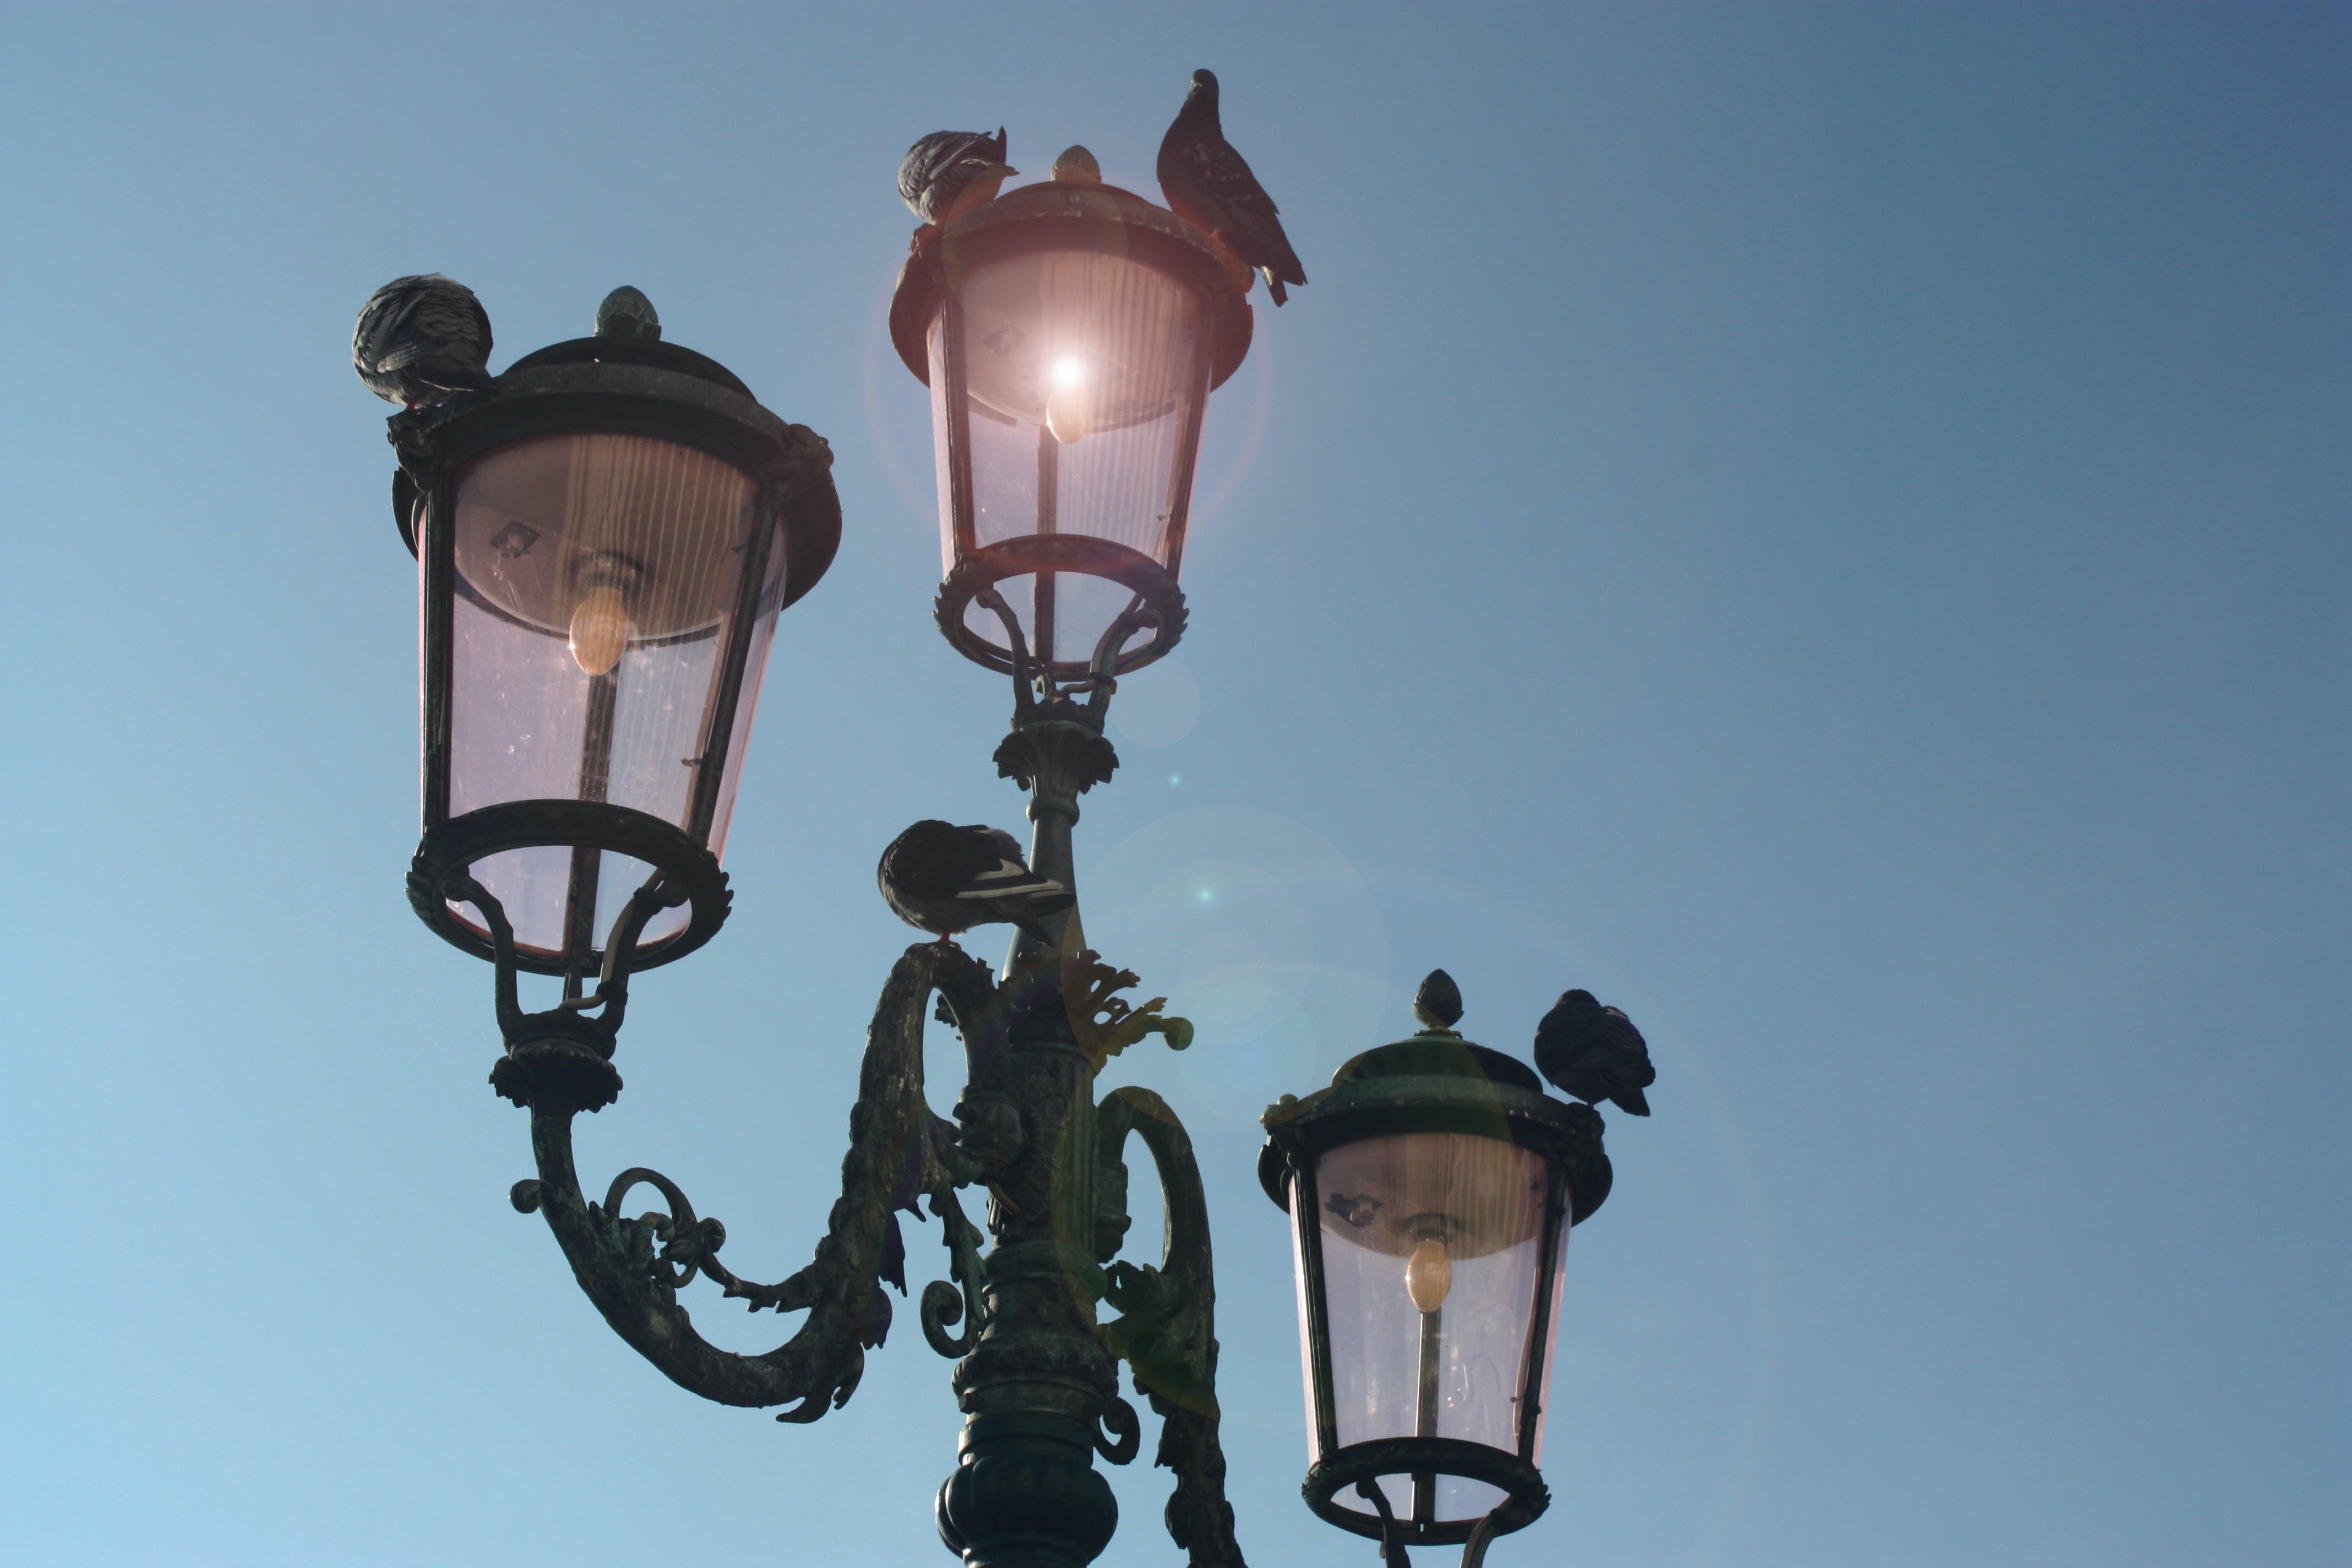 Black 3-light Post Lamp Under Blue Sky